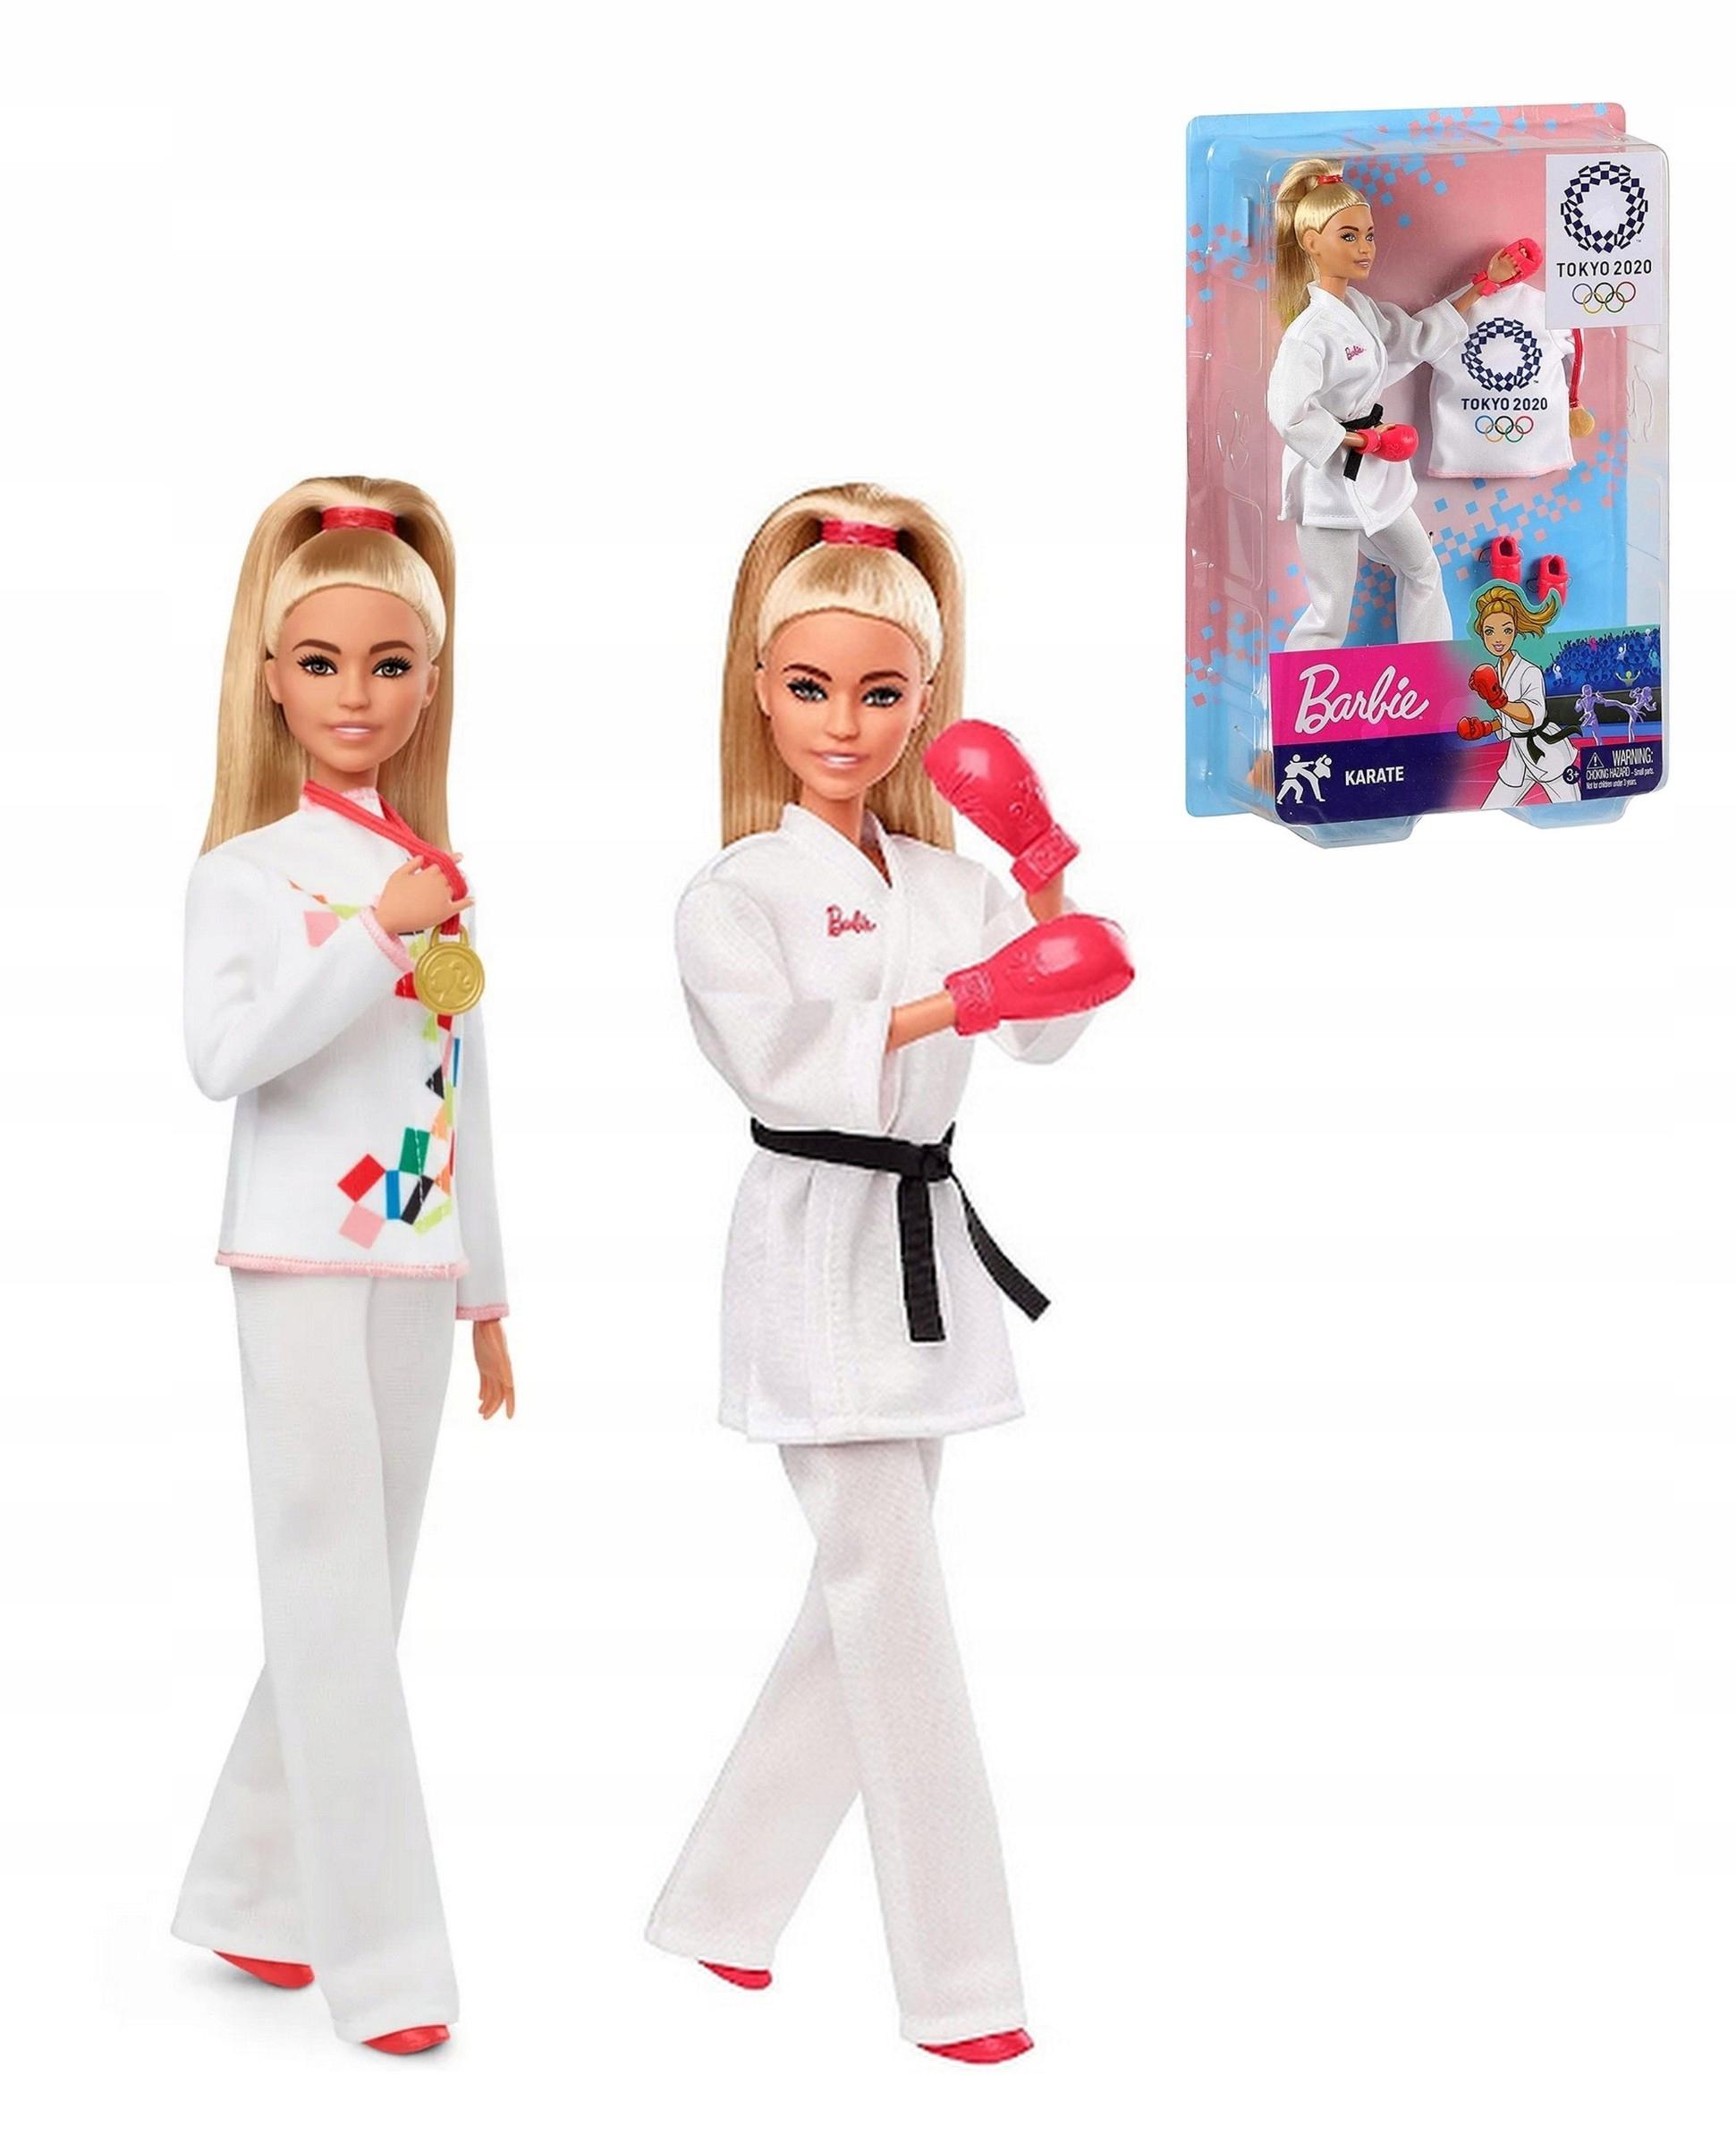 Barbie Karate Doll Tokyo 2020 Olympian GJL74 Manufacturer's code GJL74